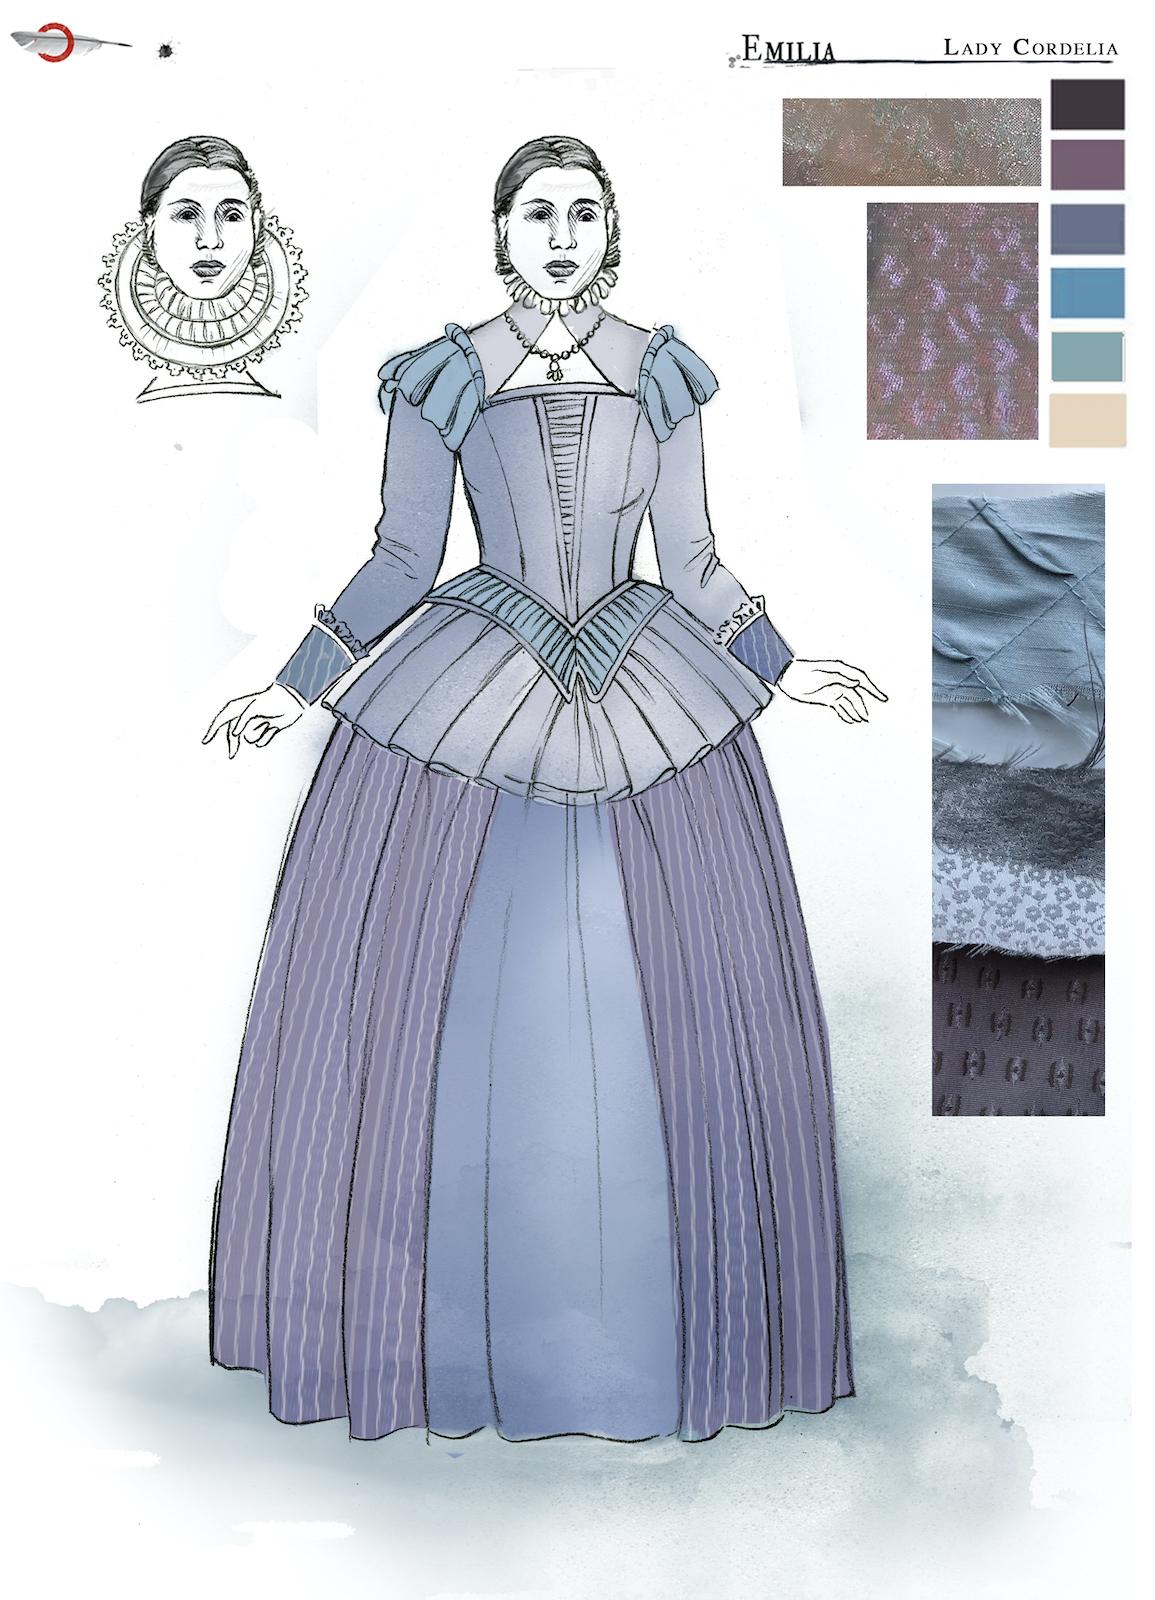 A costume sketch of a lilac Elizabethan dress